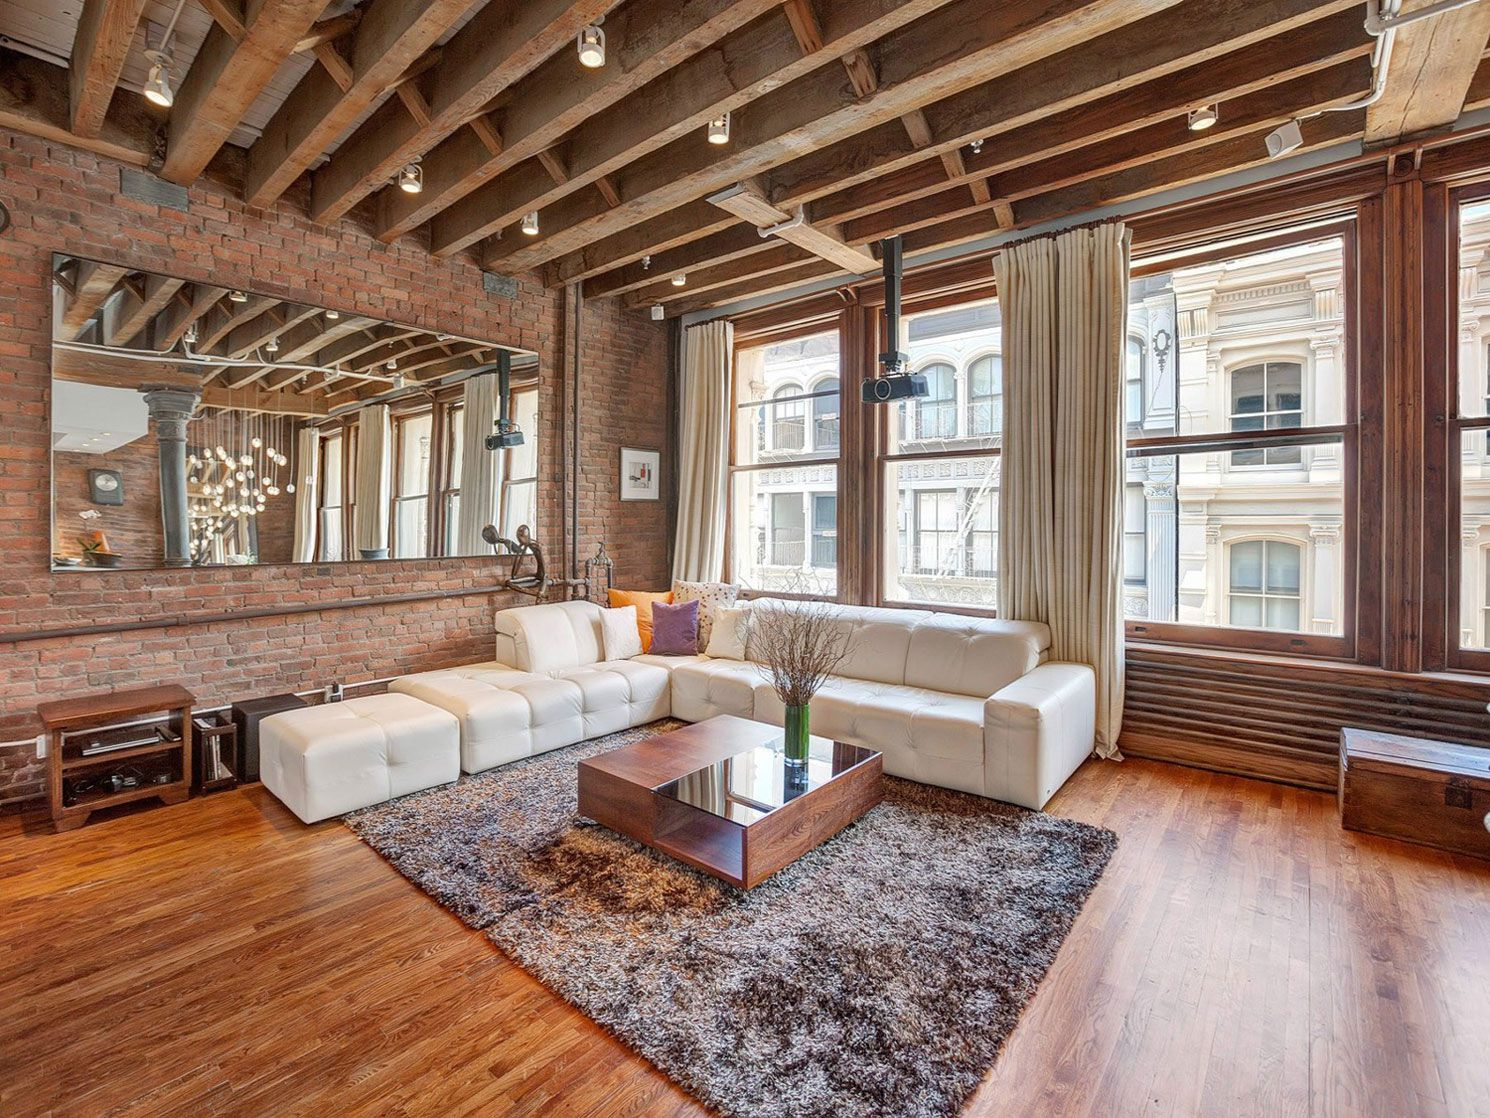 Ultimate Soho Exposed Brick and Wood Beams Loft on Prince Street in New York-03